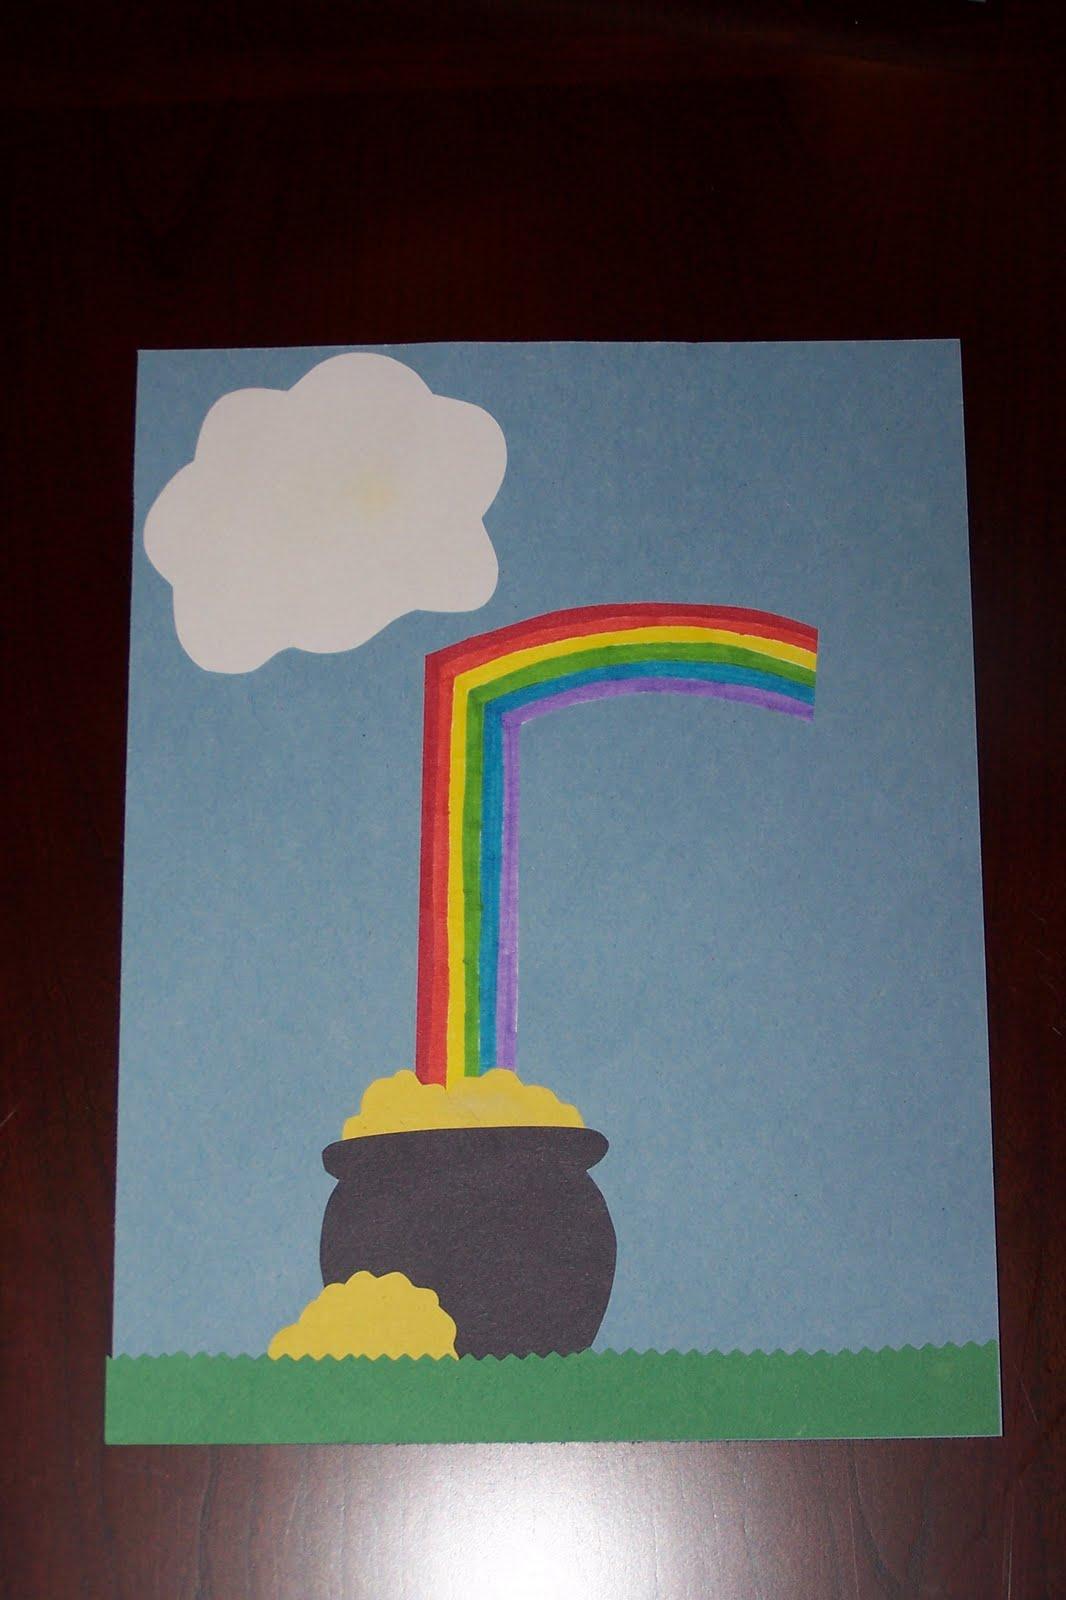 Preschool Stencil O also  also Jack And The Beanstalk furthermore Paper Plate Tambourines also Dscn. on preschool letter z